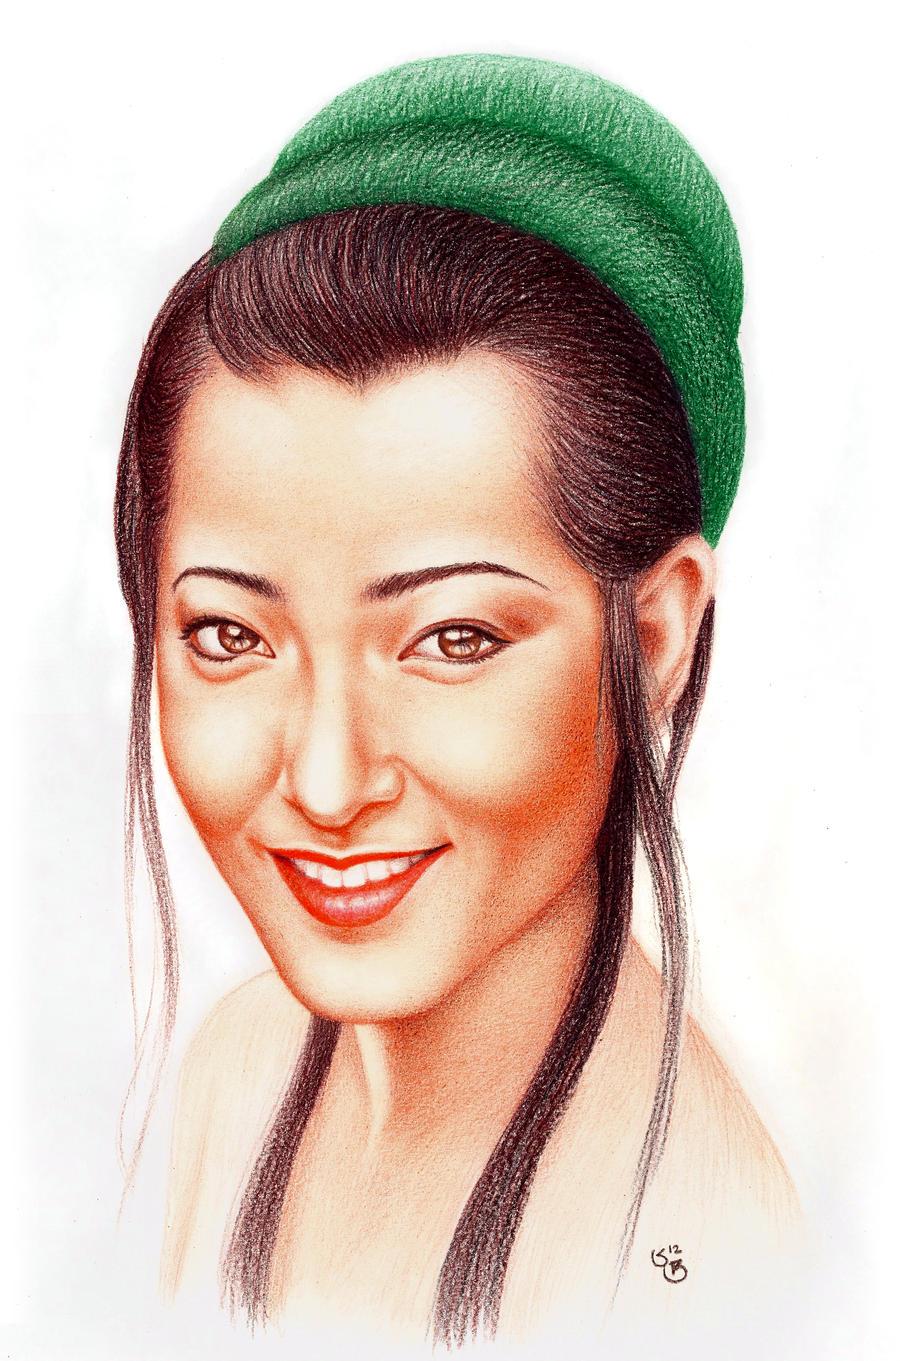 konnichiwa by subhankar-biswas